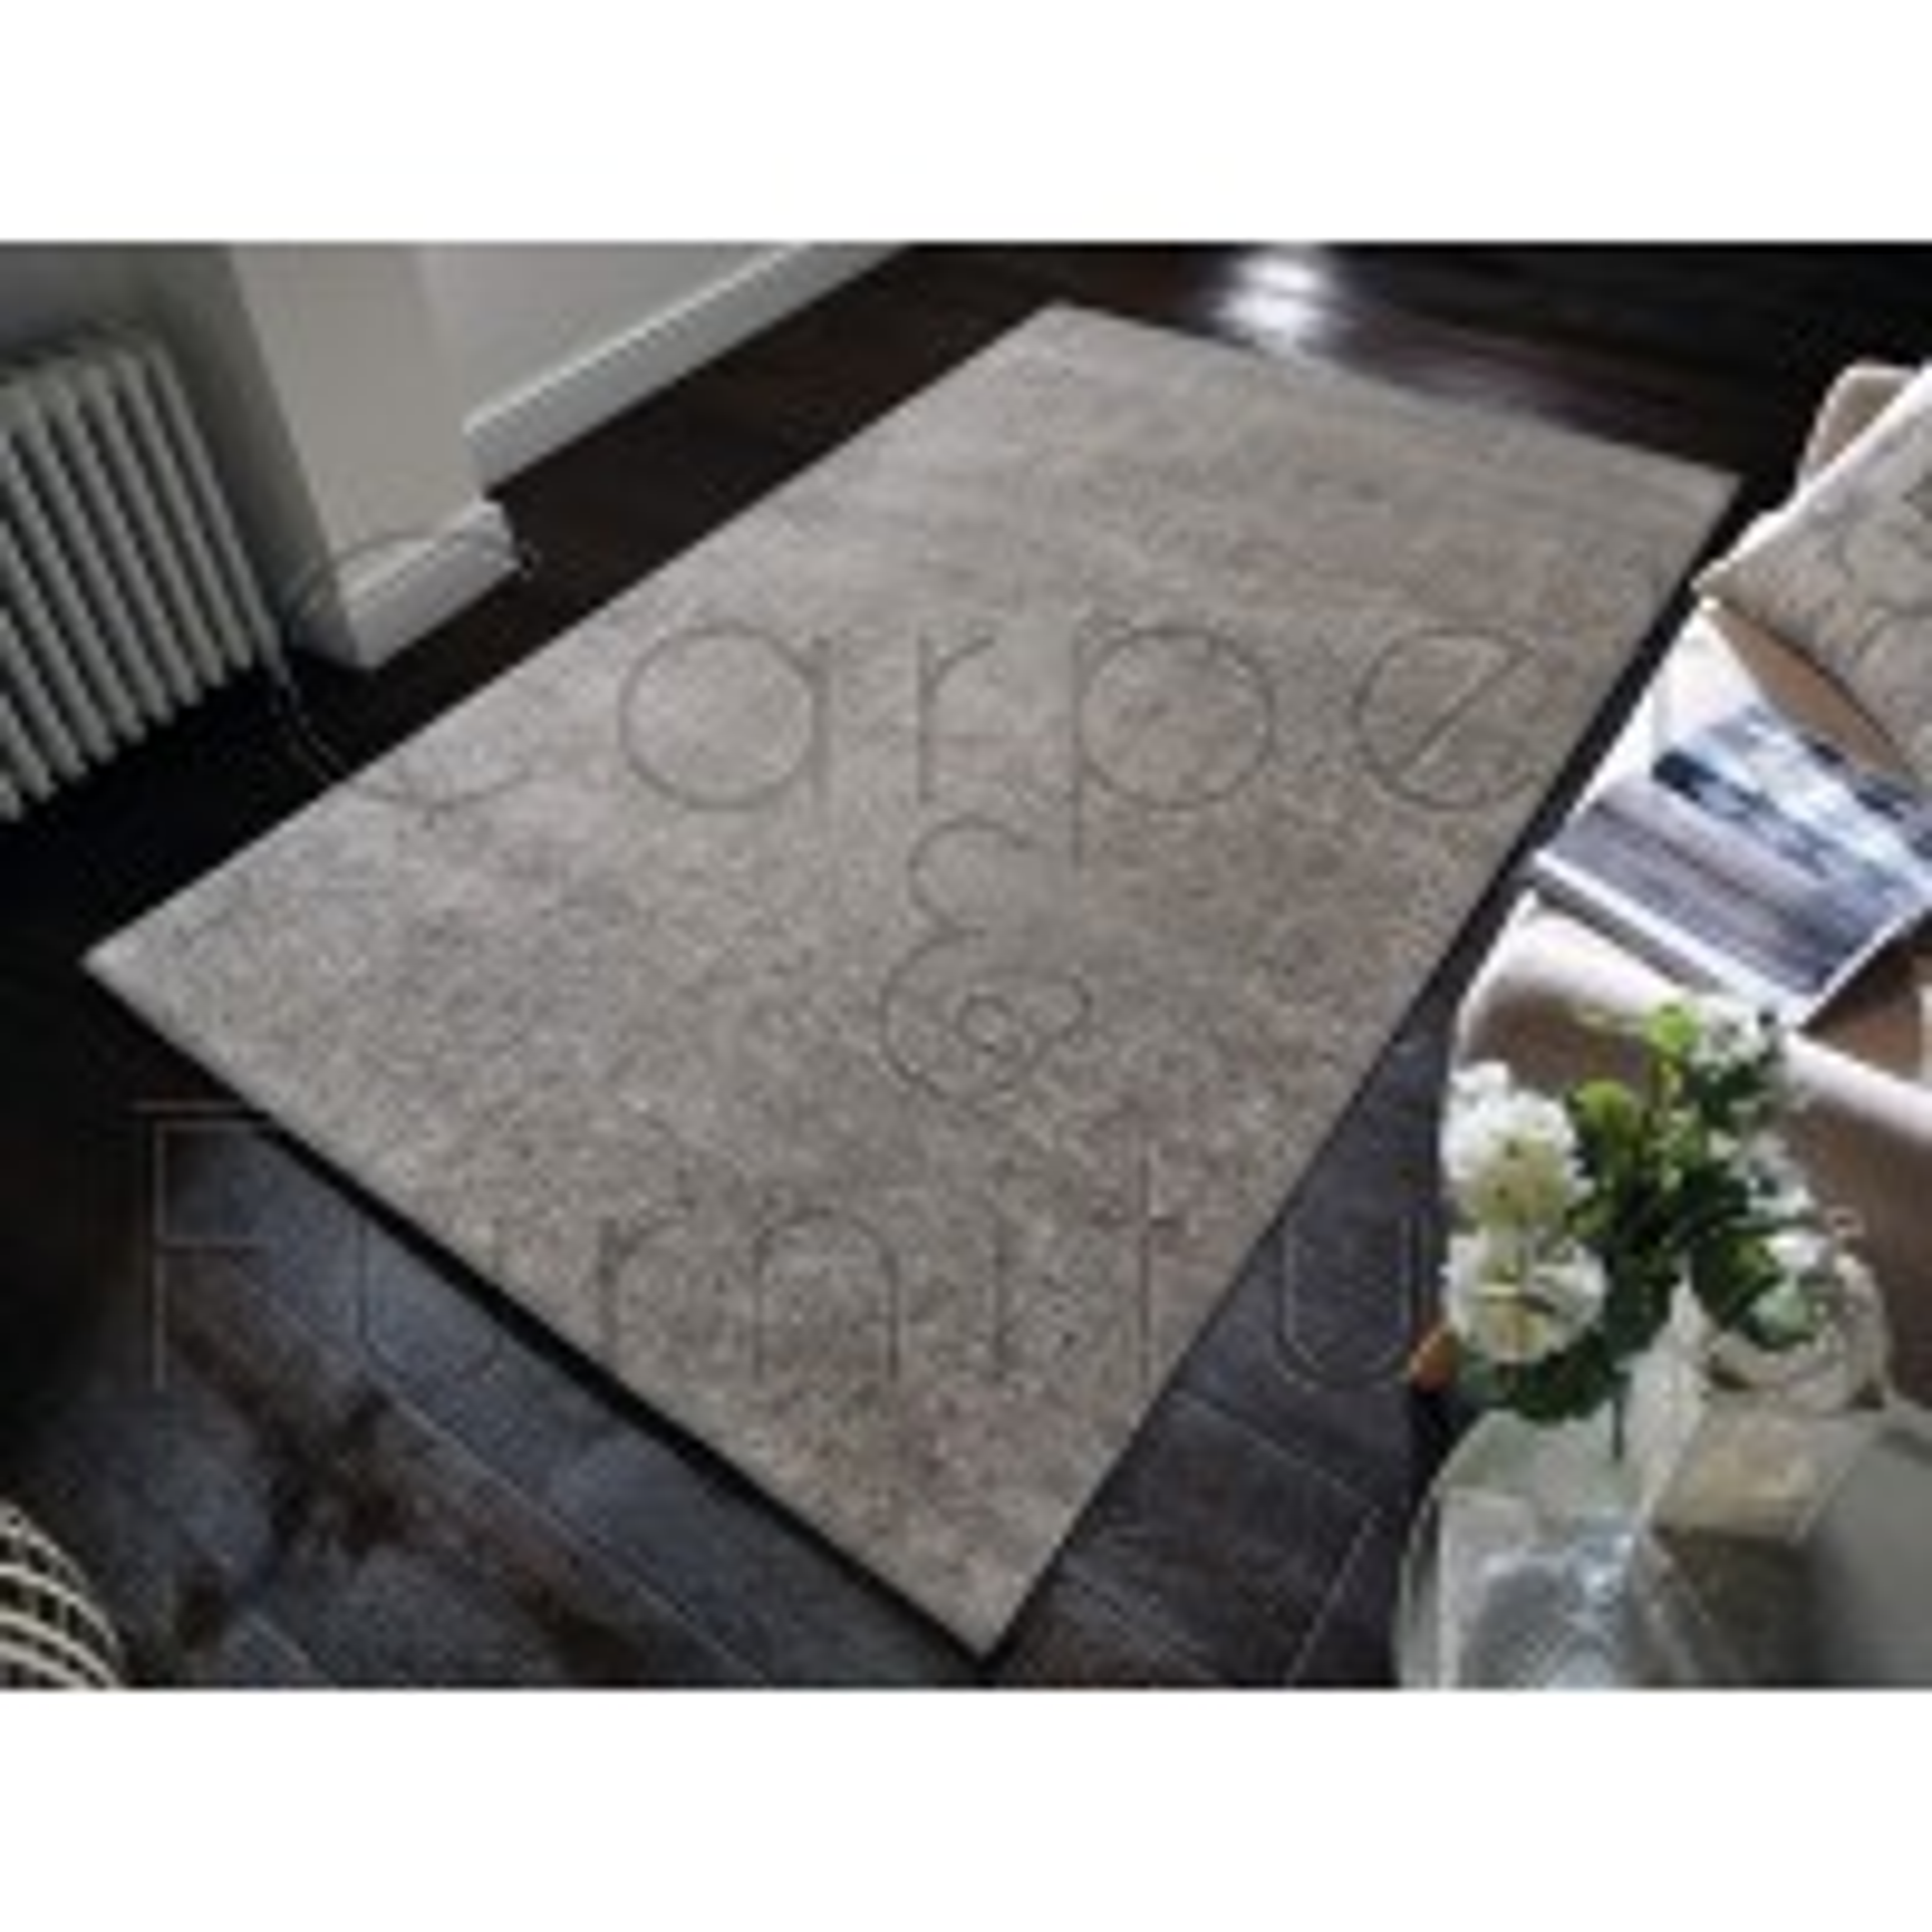 "Velvet Shaggy Rug - Silver - Size 80 x 150 cm (2'8"" x 5')"